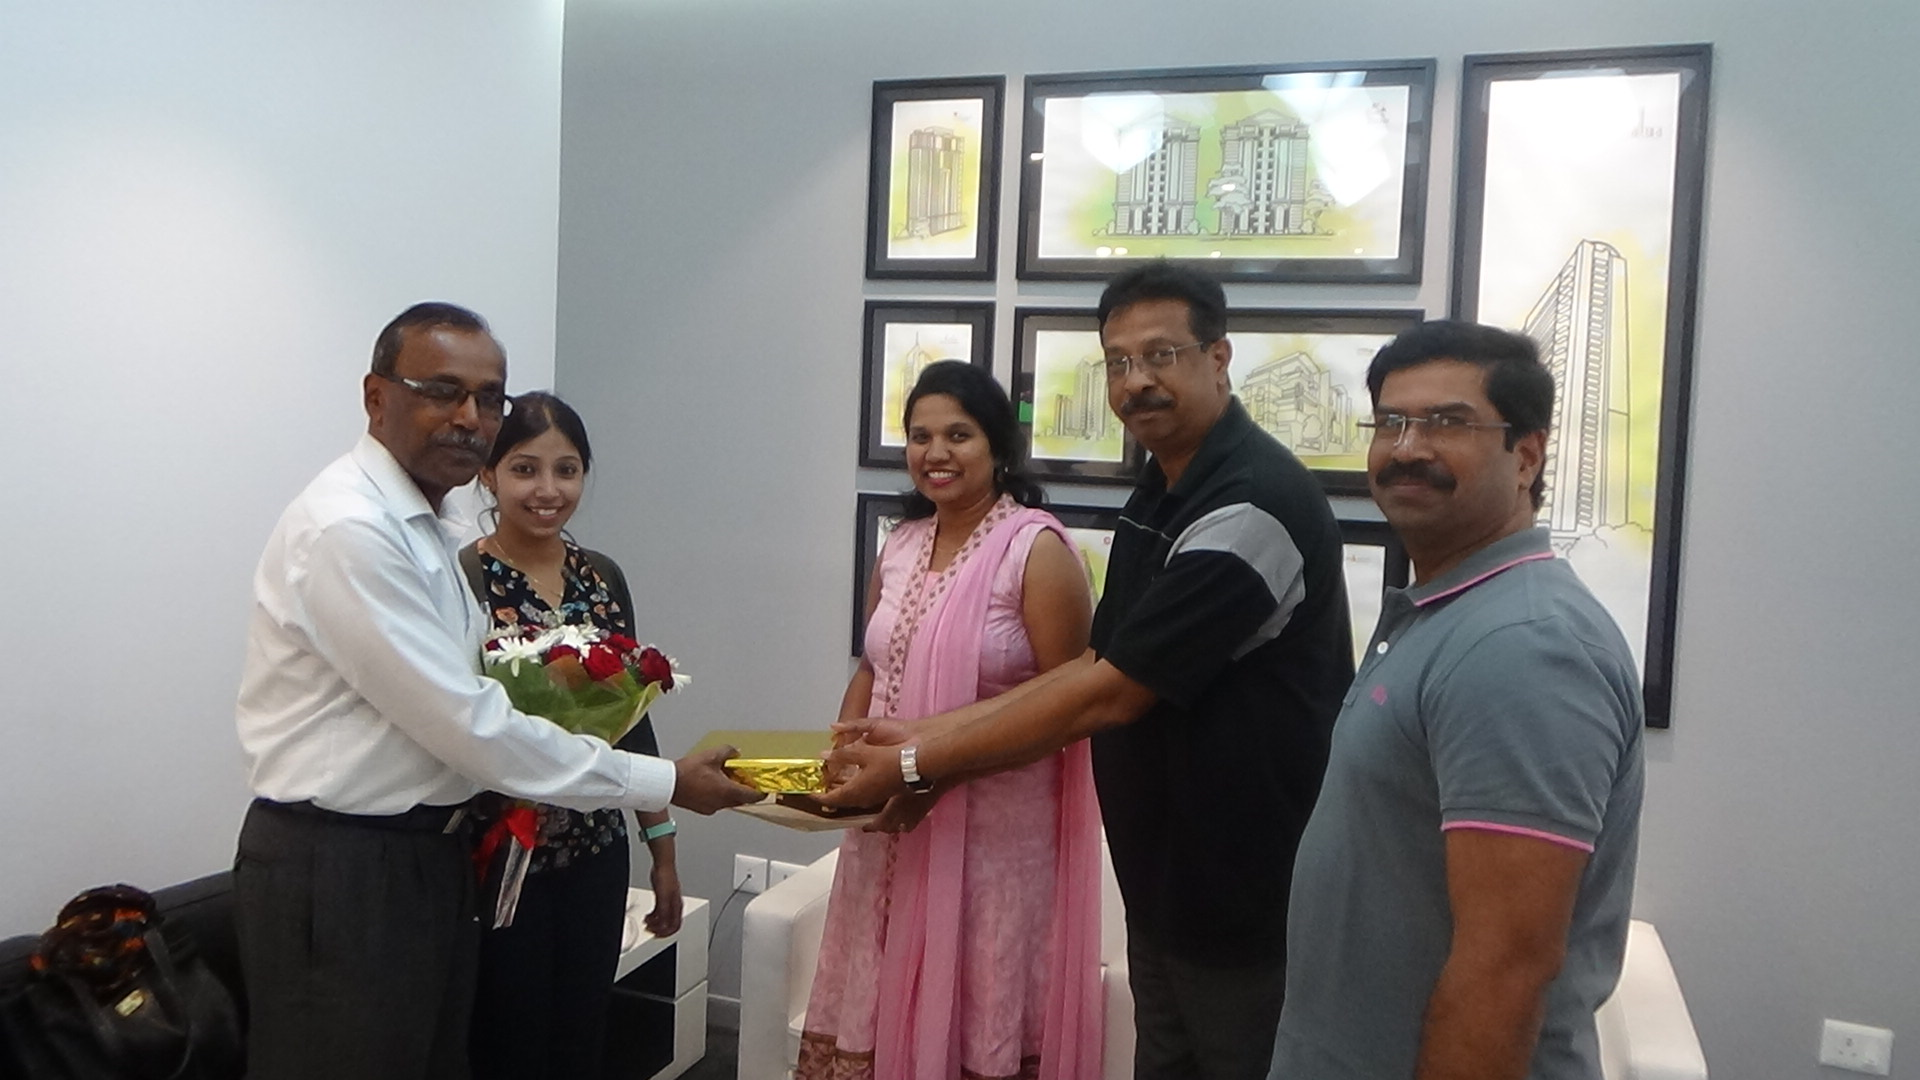 Shikha Subidhi